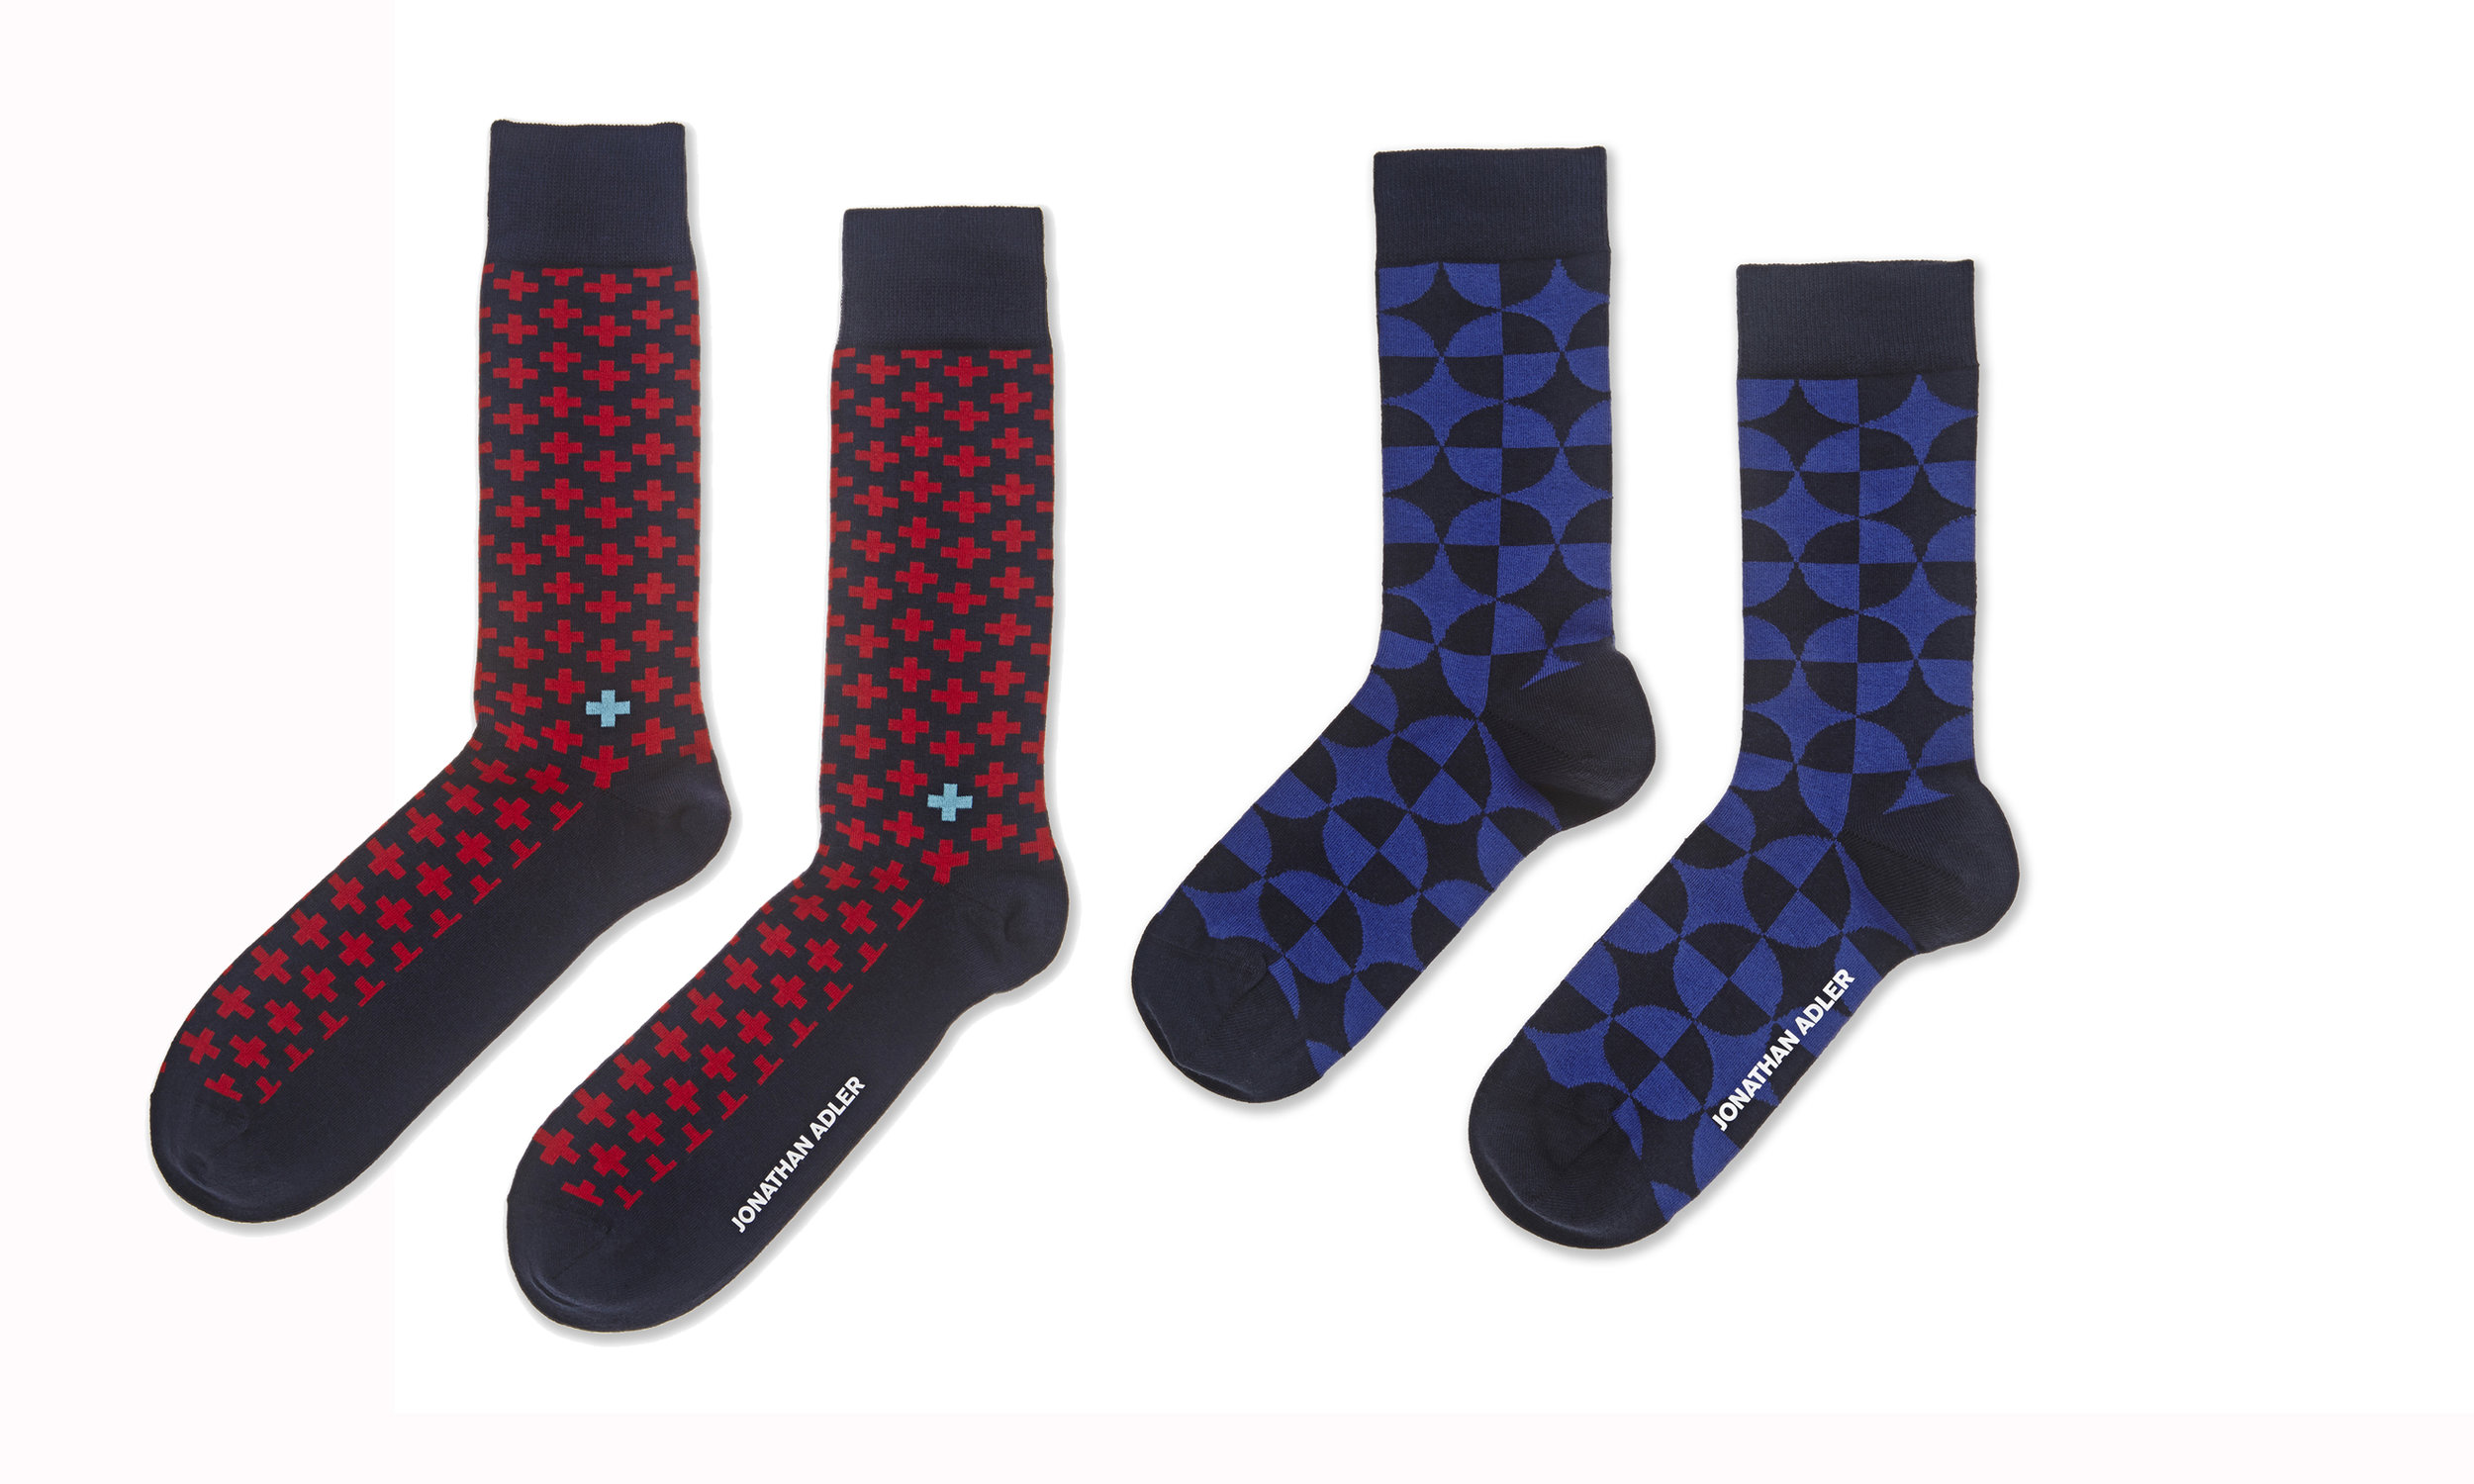 socks_comp_web.jpg